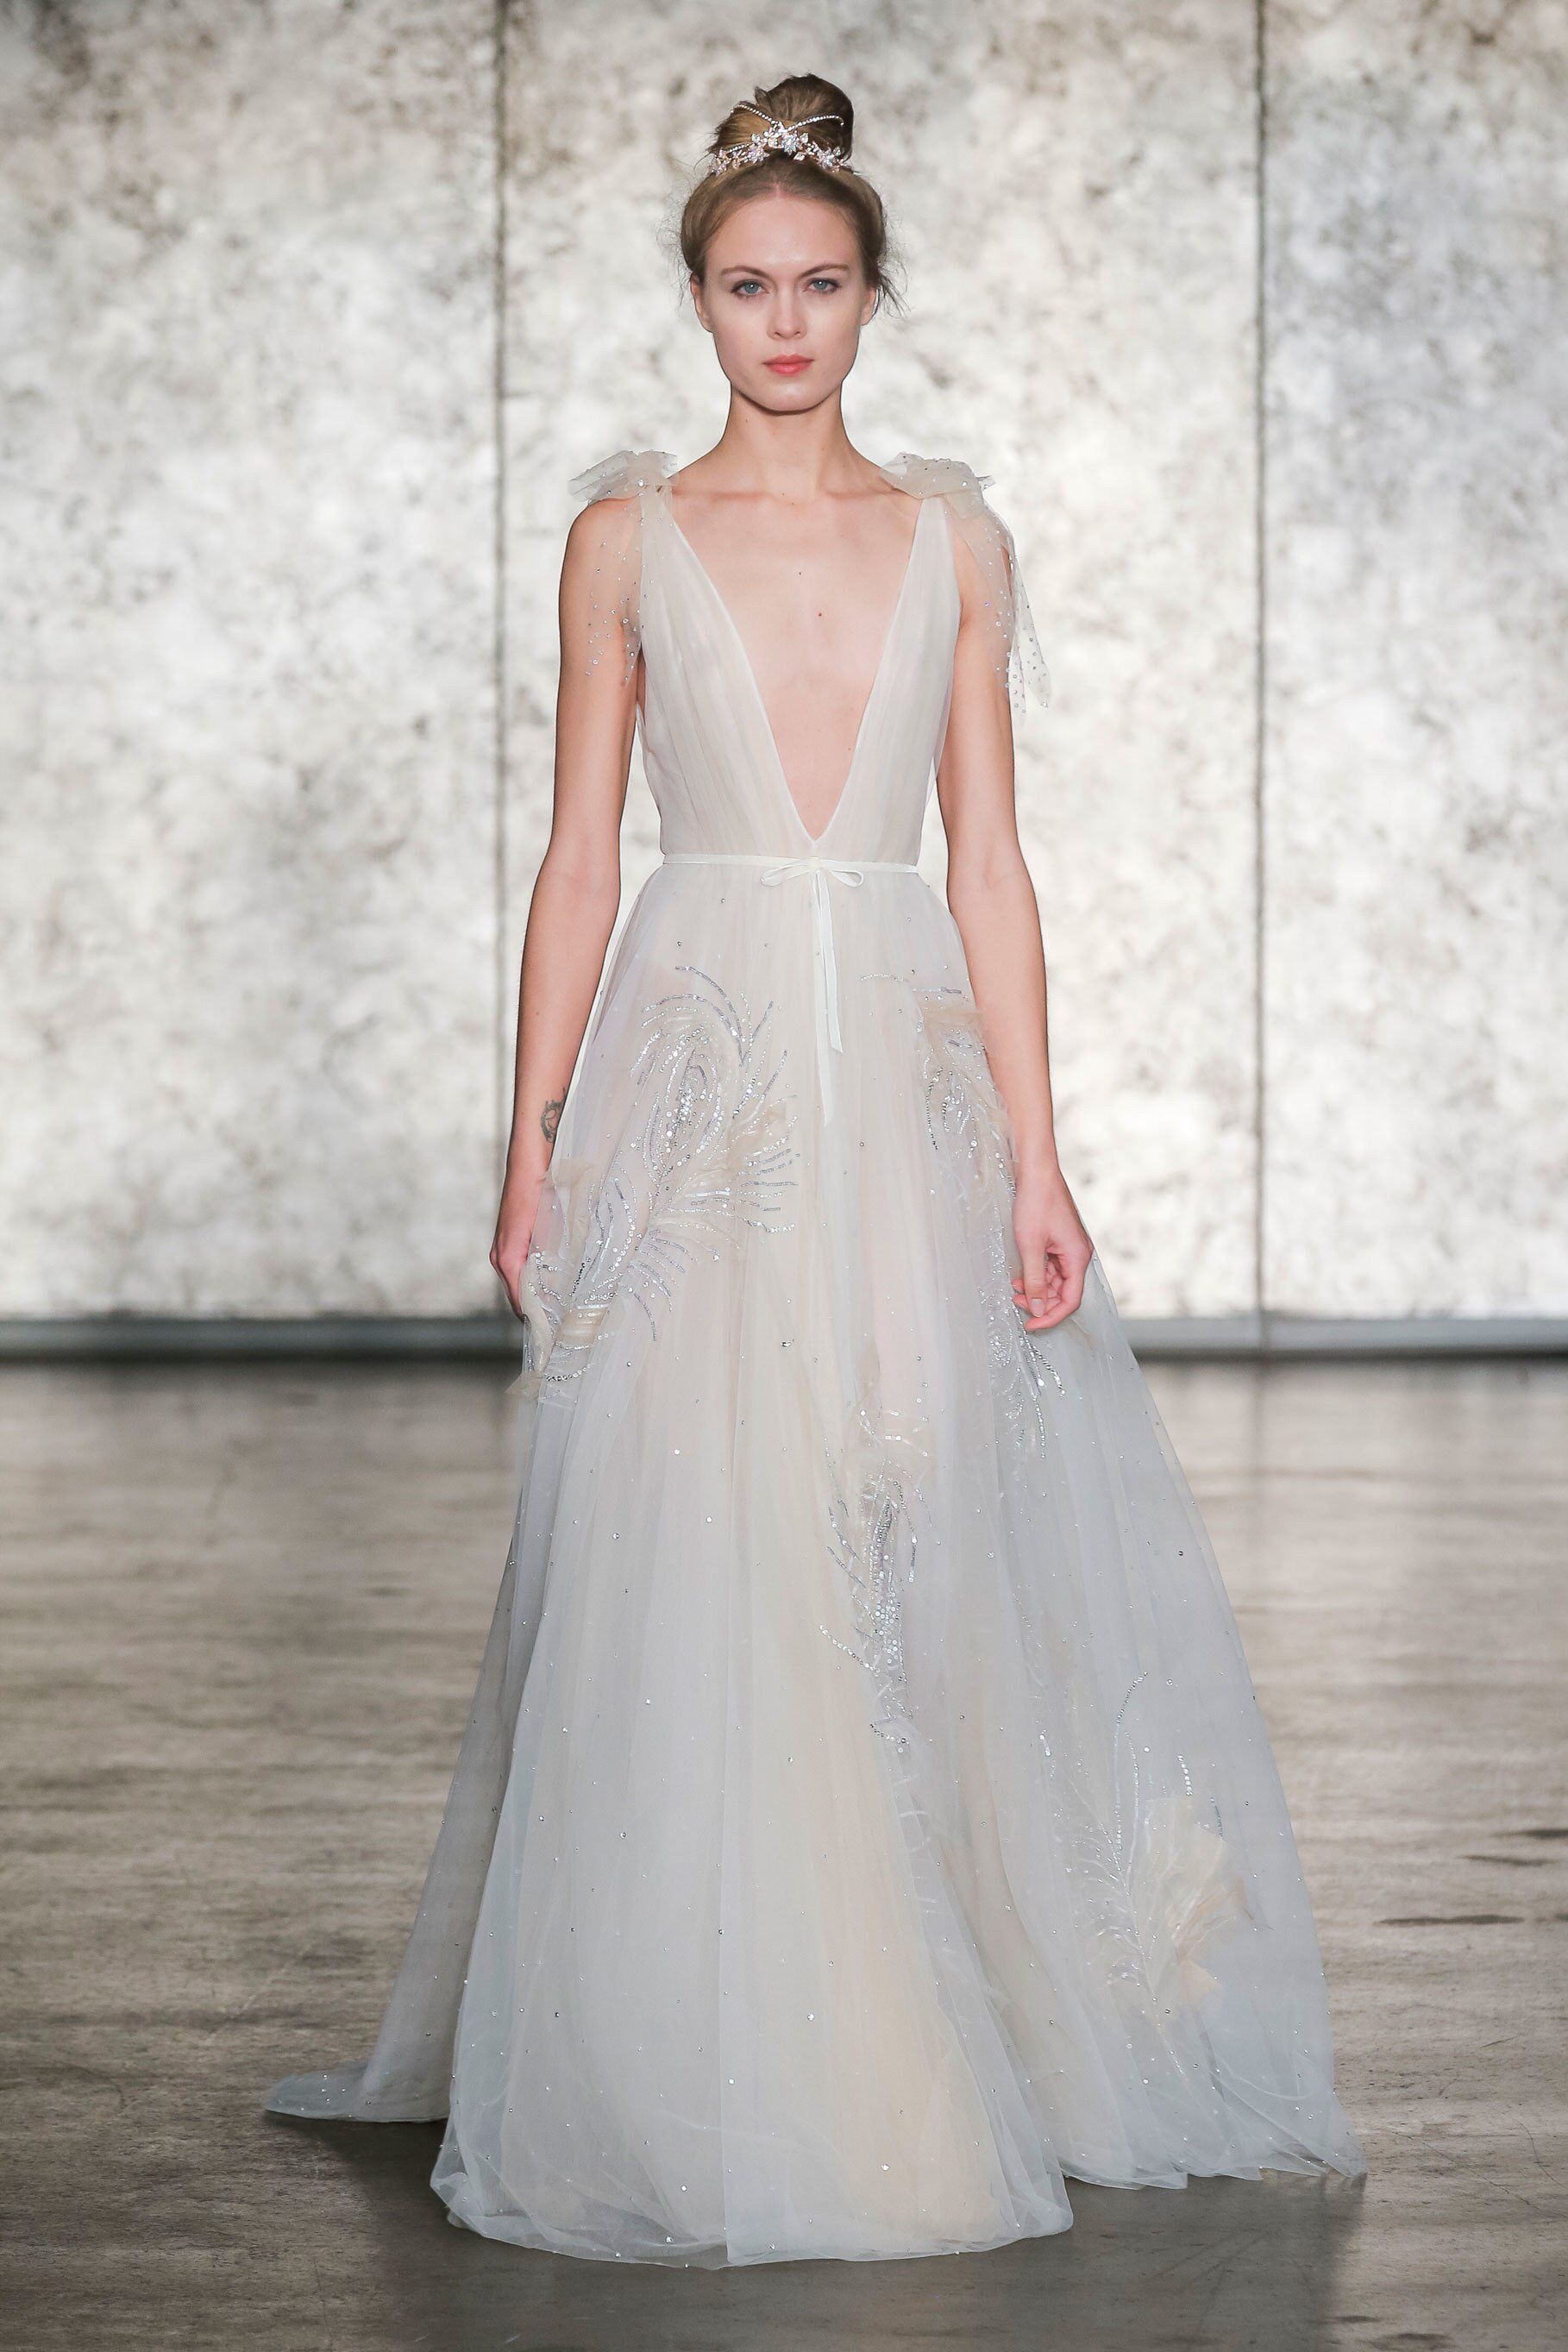 Inbal dror bridal fall fashion show collection wedding style